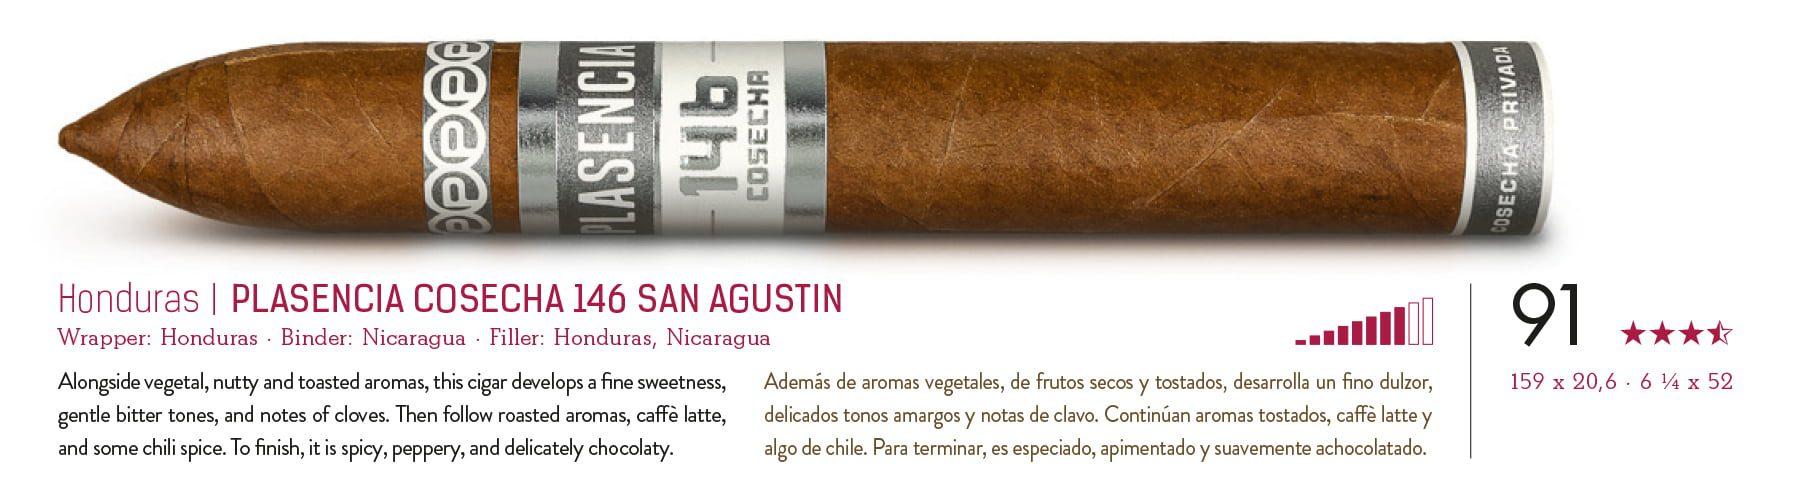 Plasencia Cosecha 146 San Agustin